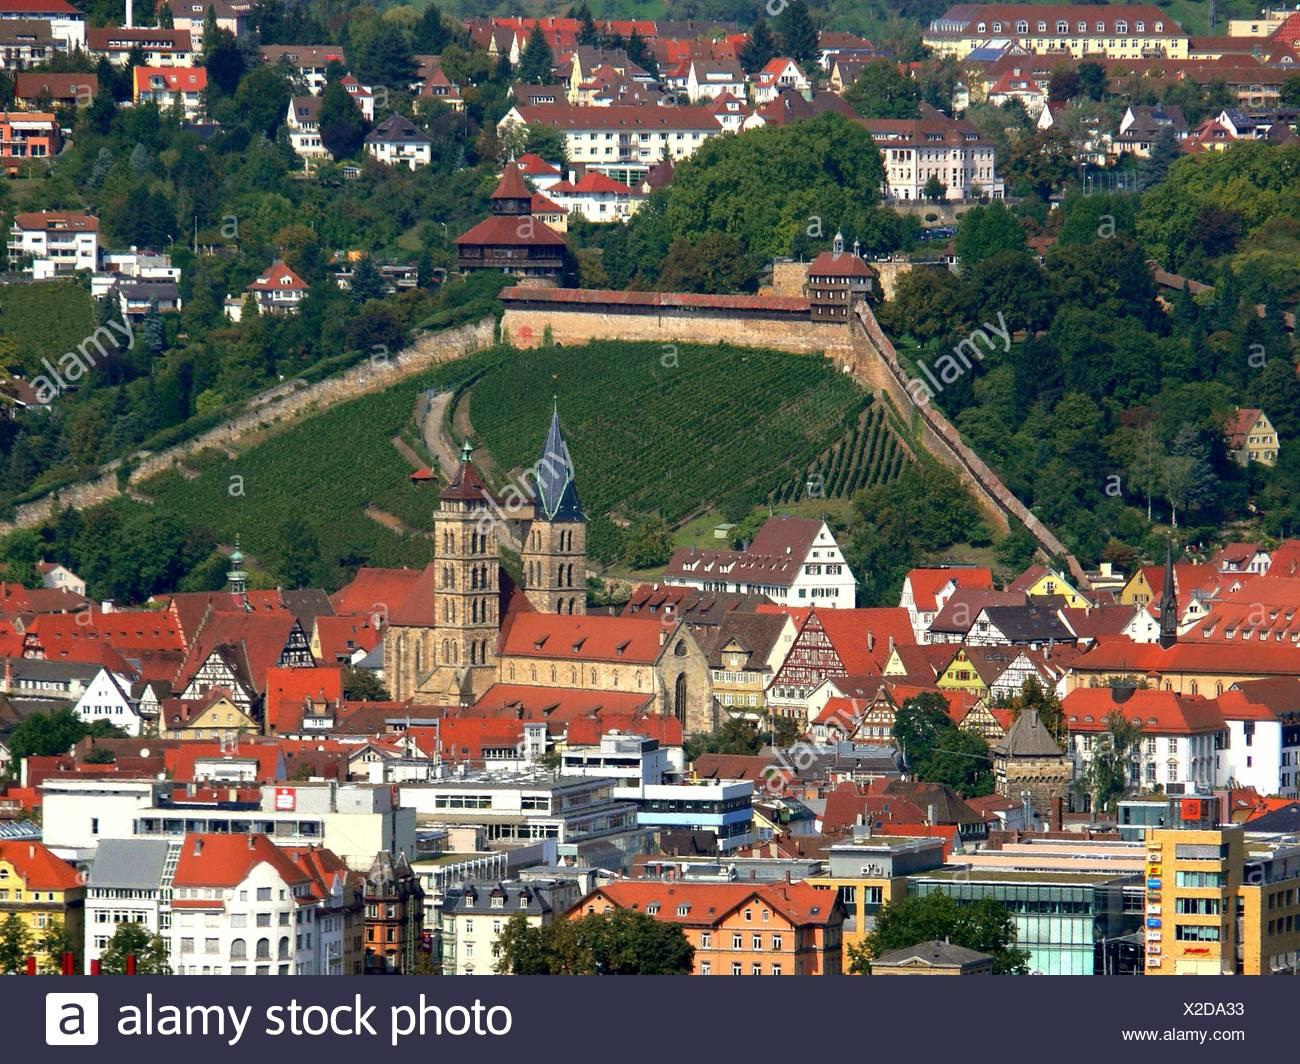 Weinberge Stadtbild Übersicht totale Schloss Burg Mittelalter esslingen Stockbild